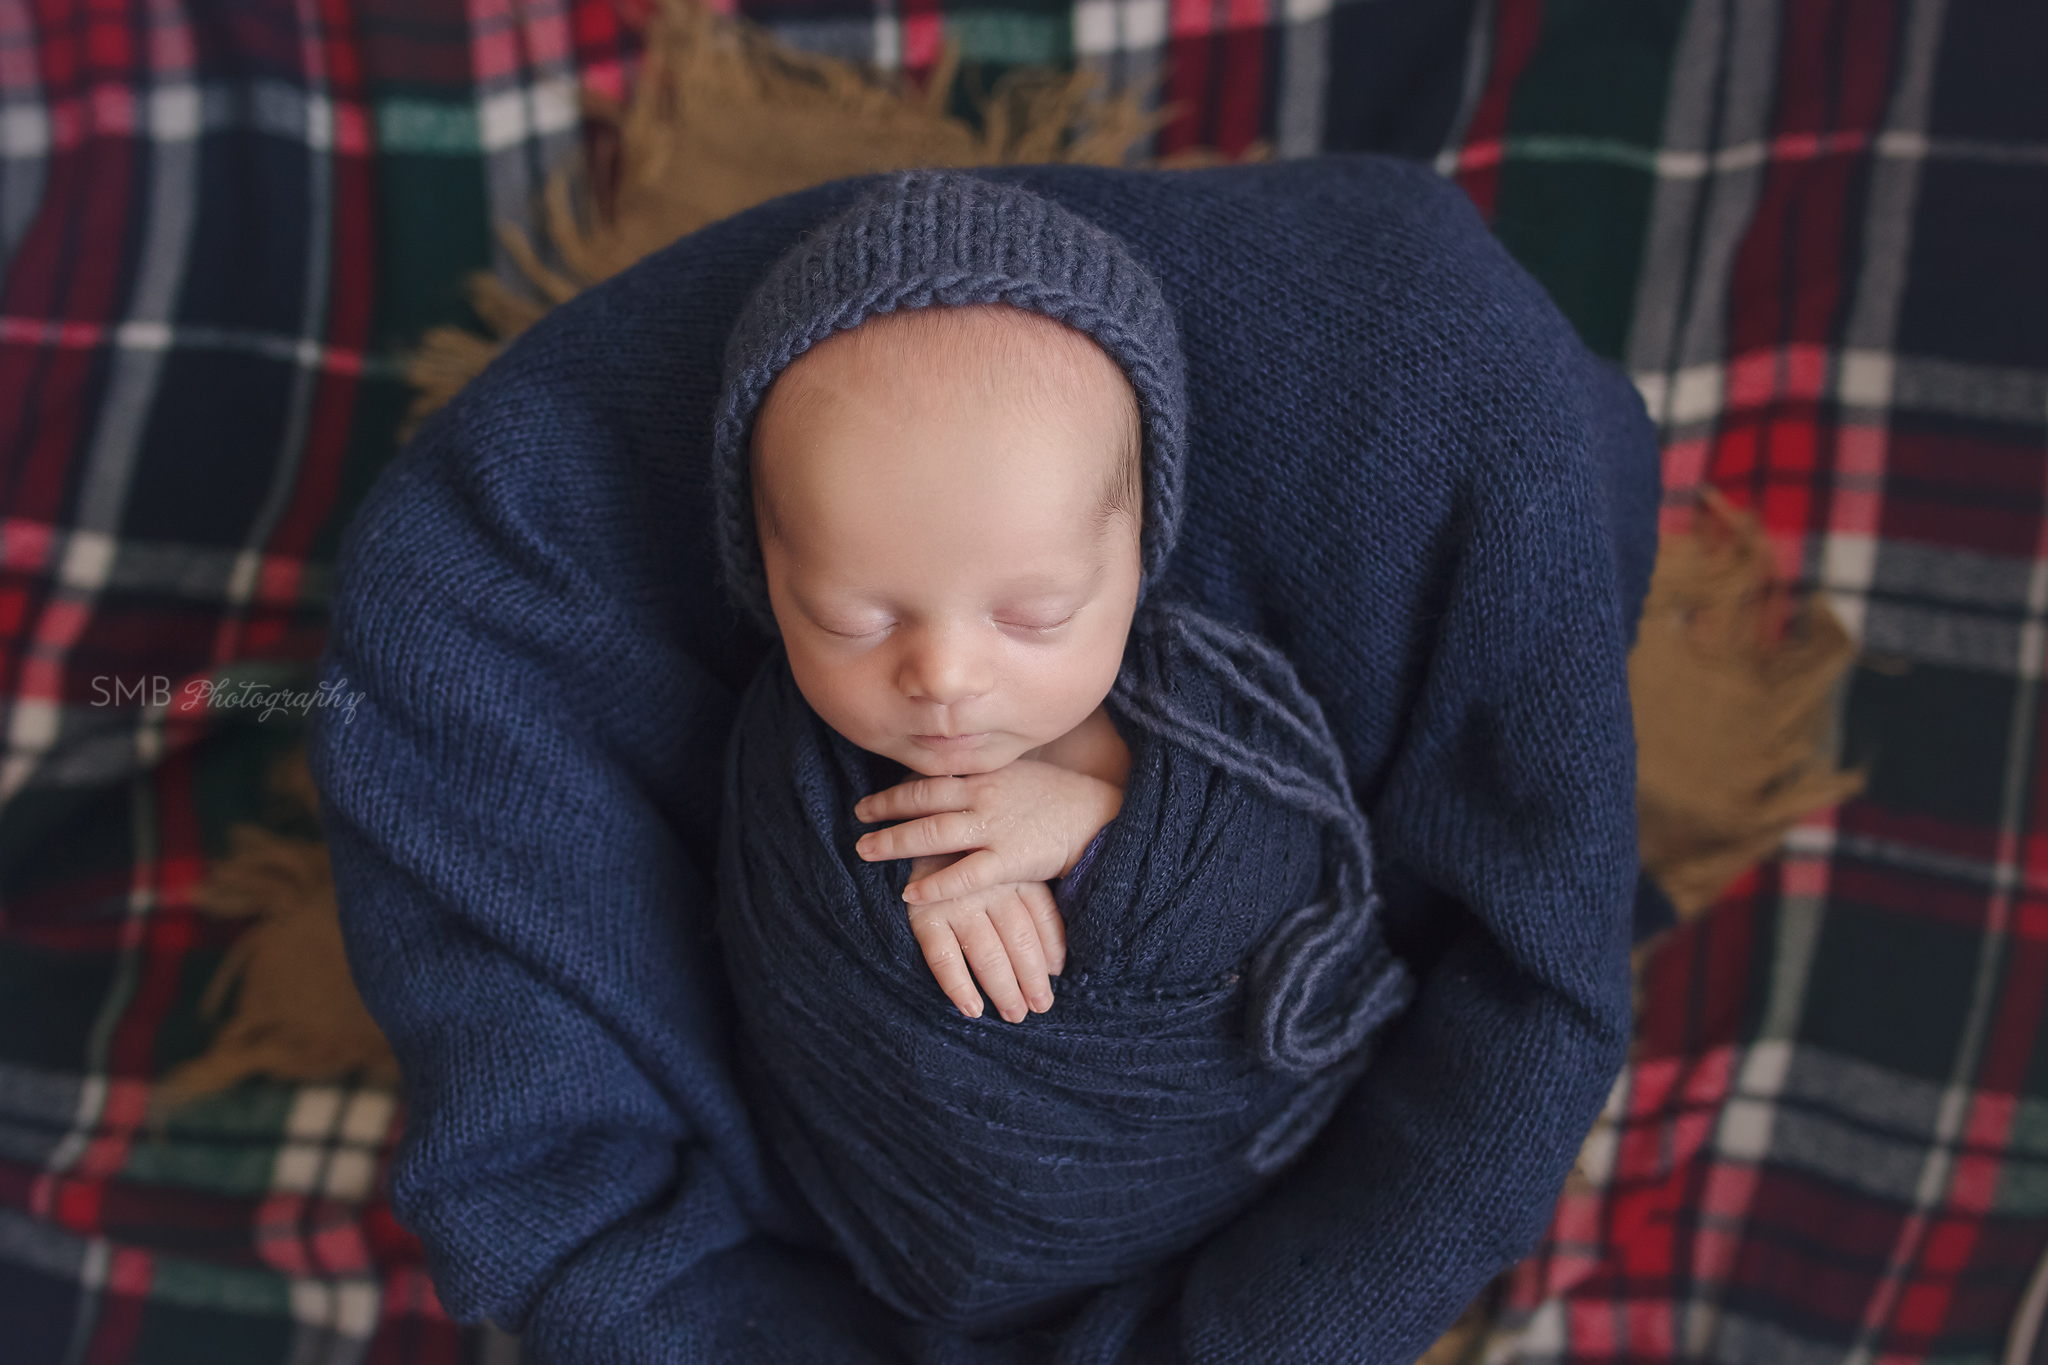 Oklahoma City Newborn Photographer | An Adoption Story: Baby J